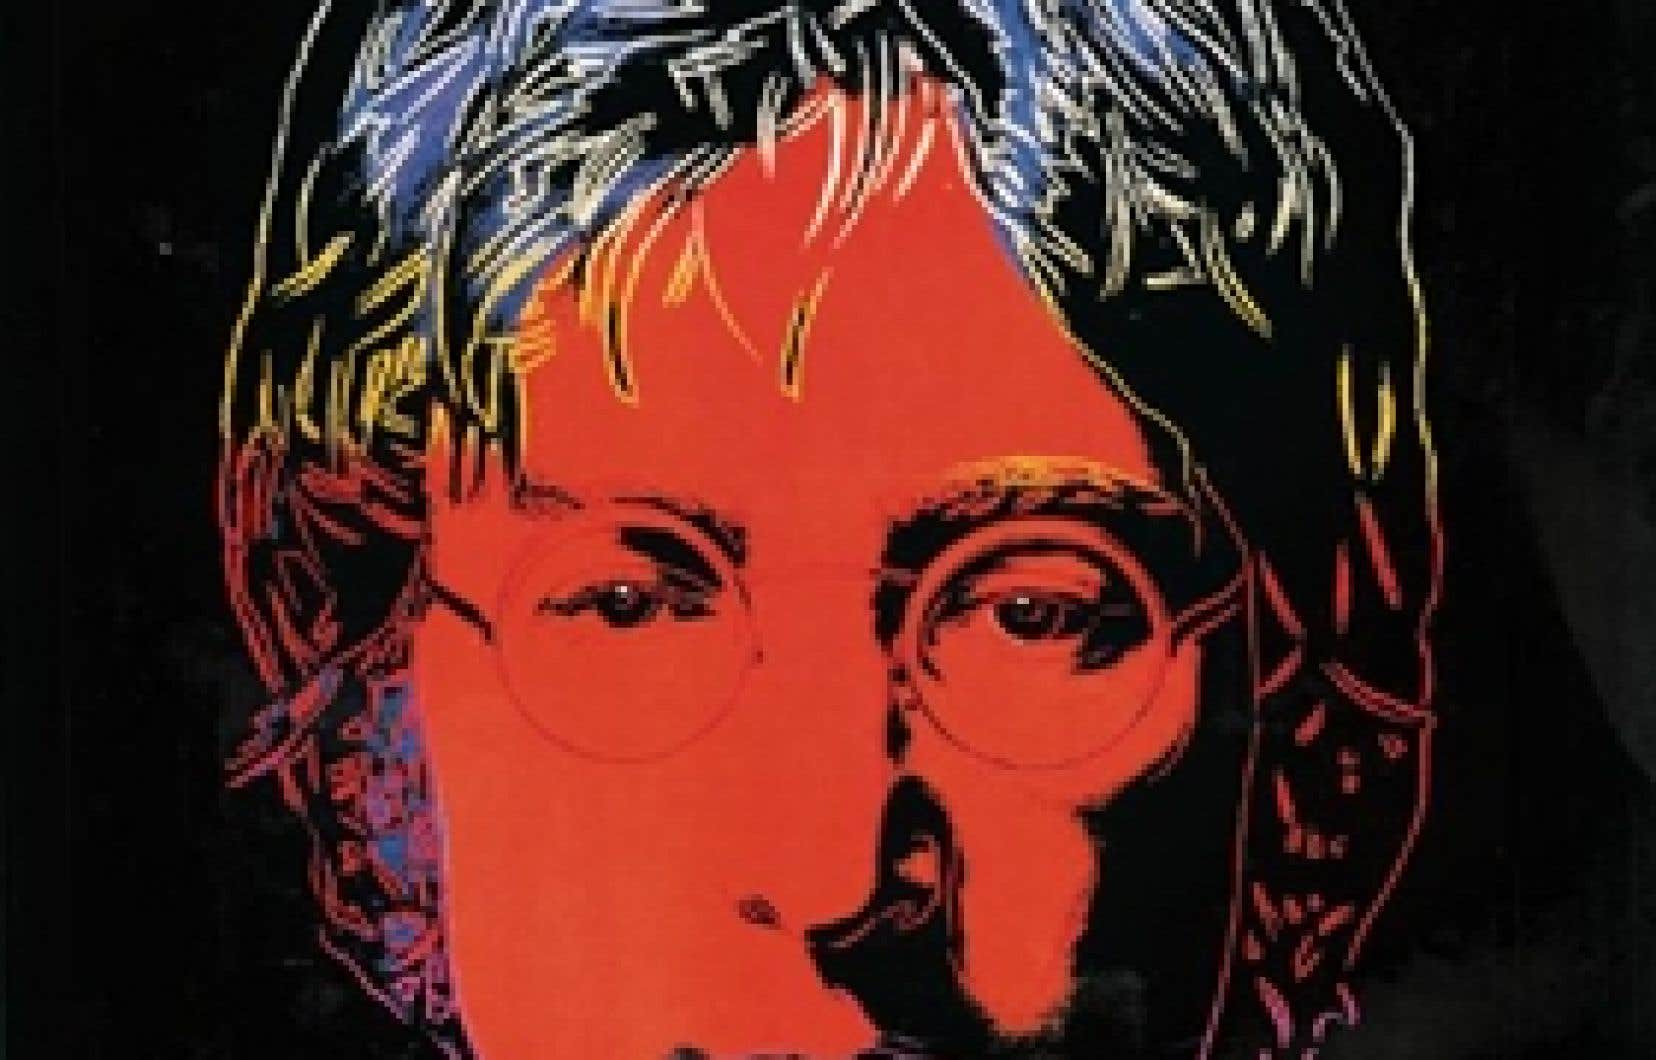 Pochette du disque de John Lennon Menlove Ave., 1986